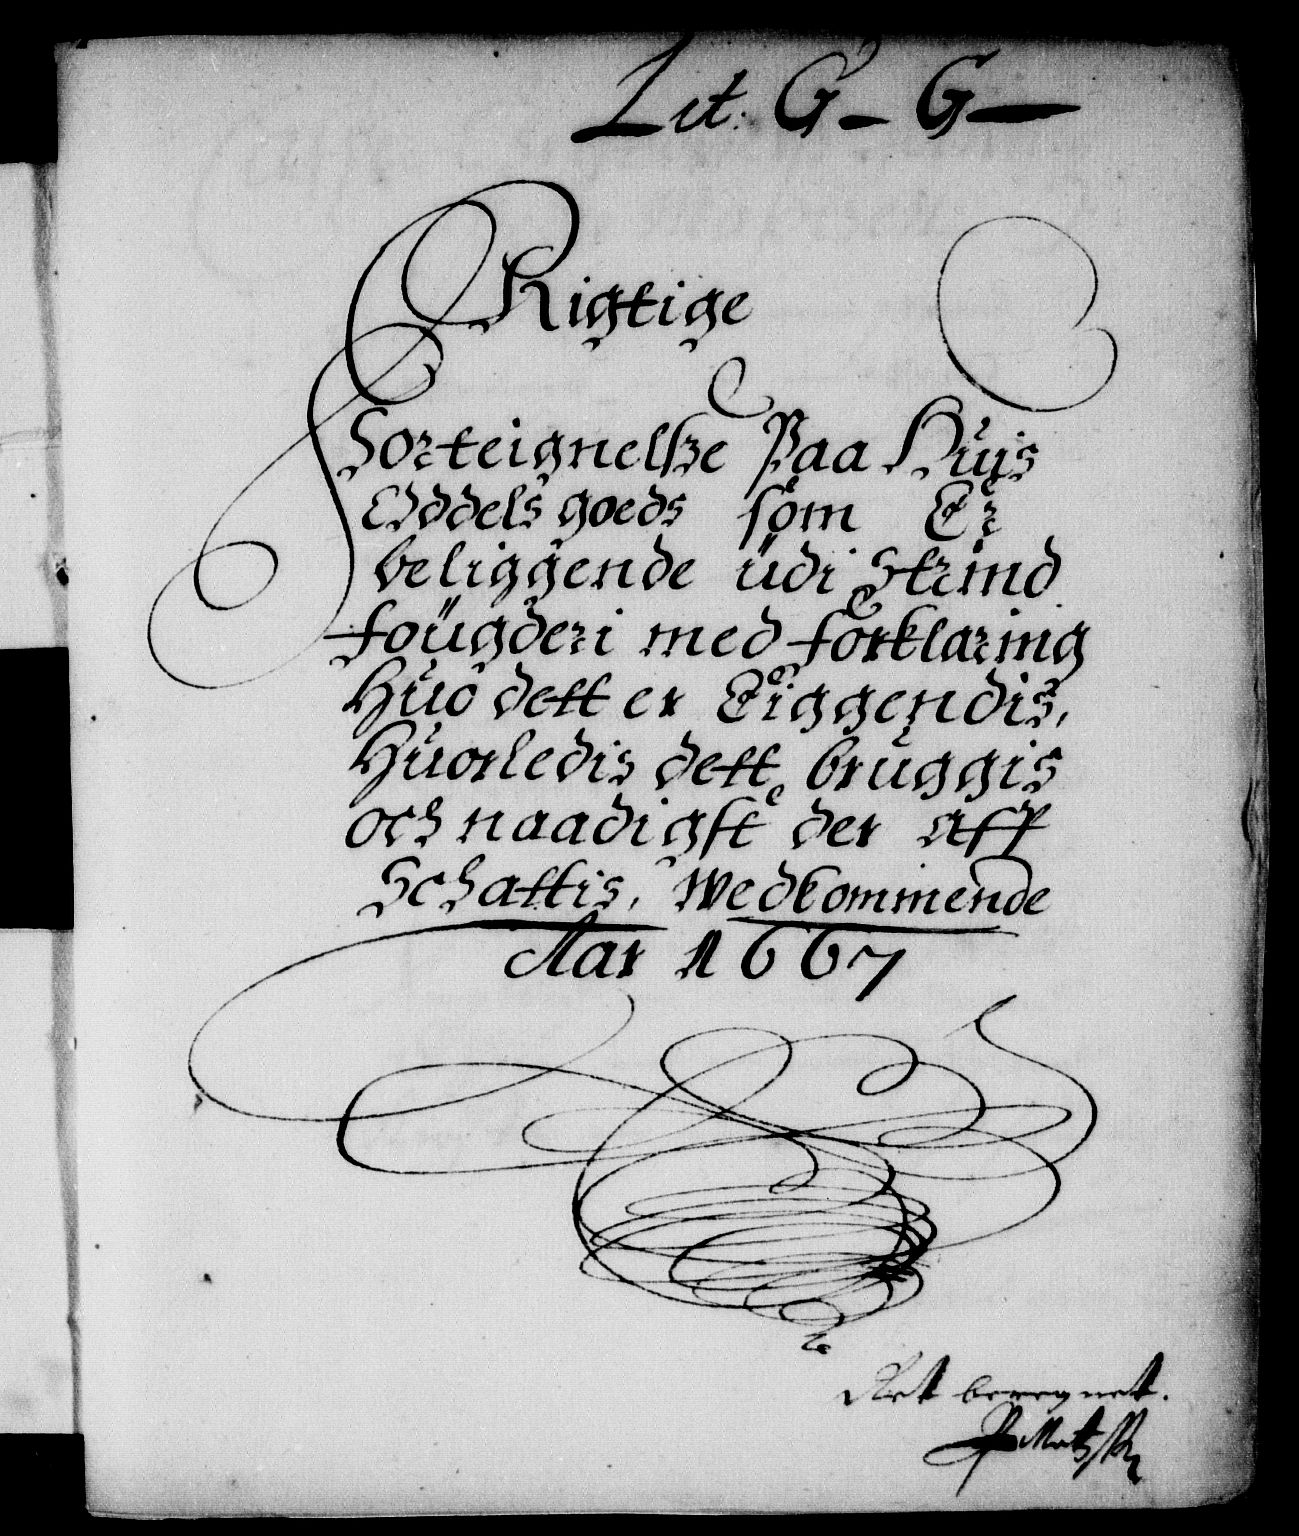 RA, Rentekammeret inntil 1814, Reviderte regnskaper, Stiftamtstueregnskaper, Trondheim stiftamt og Nordland amt, R/Rd/L0021: Trondheim stiftamt, 1667